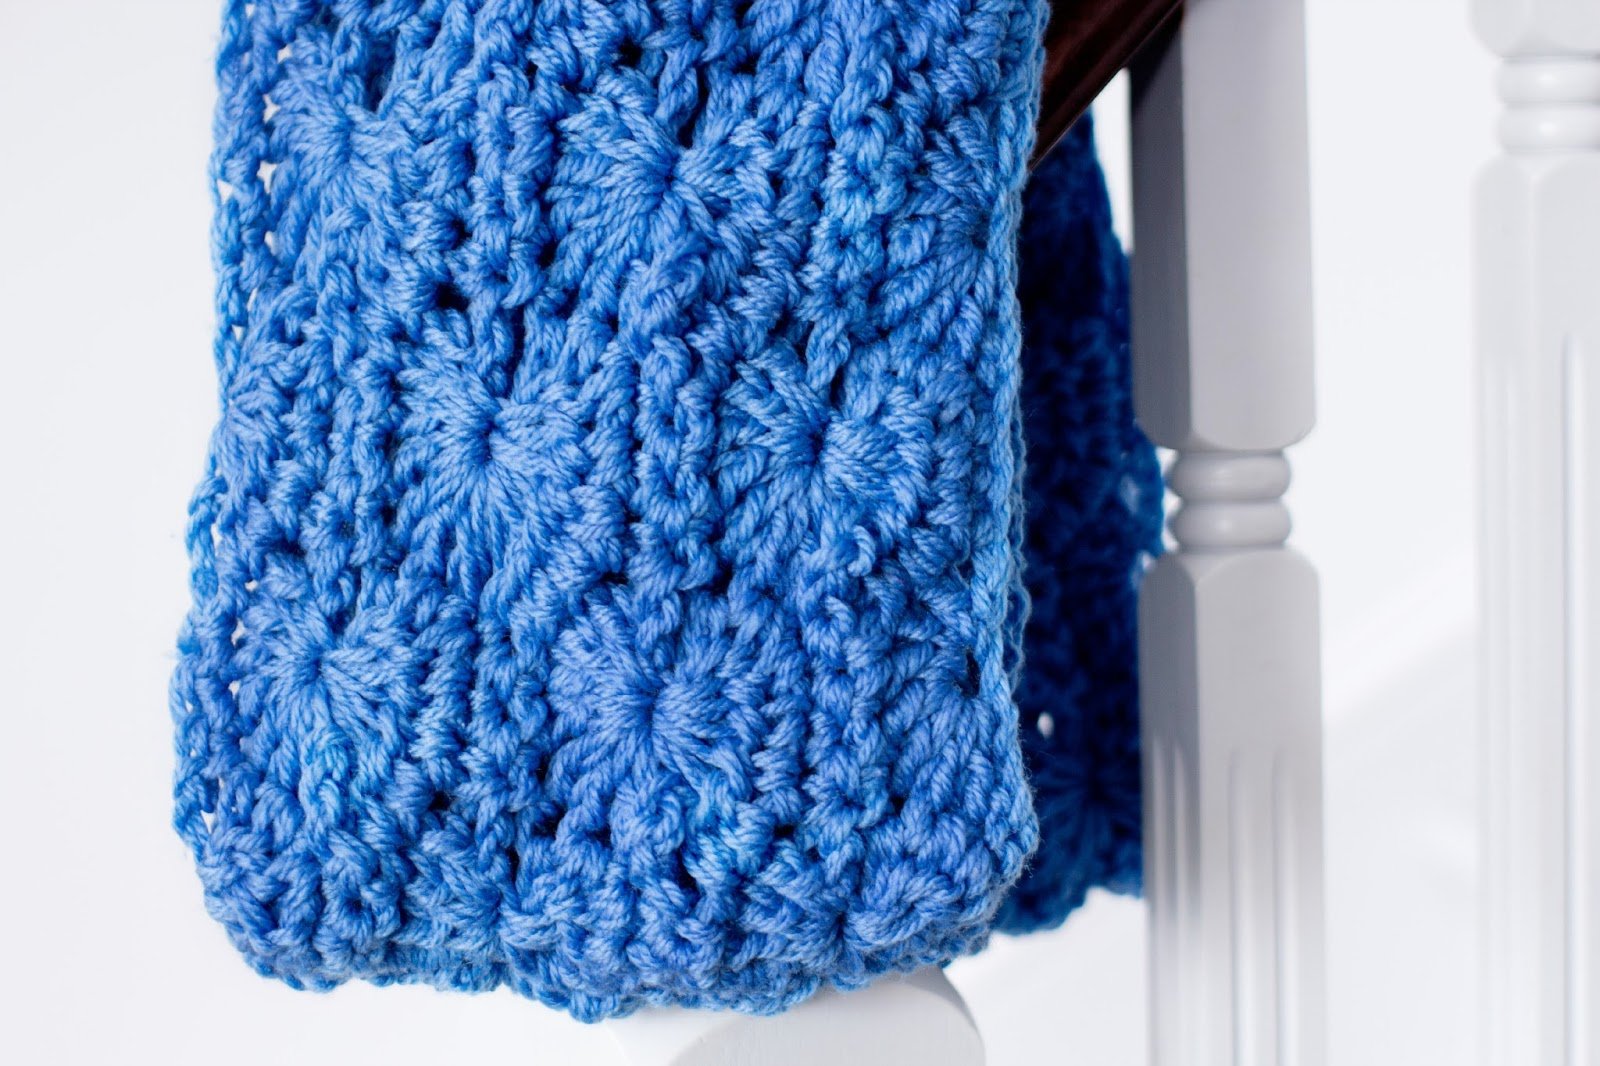 Crochet Pattern Com : Unique Gift ~ Infinity Scarf Crochet Pattern